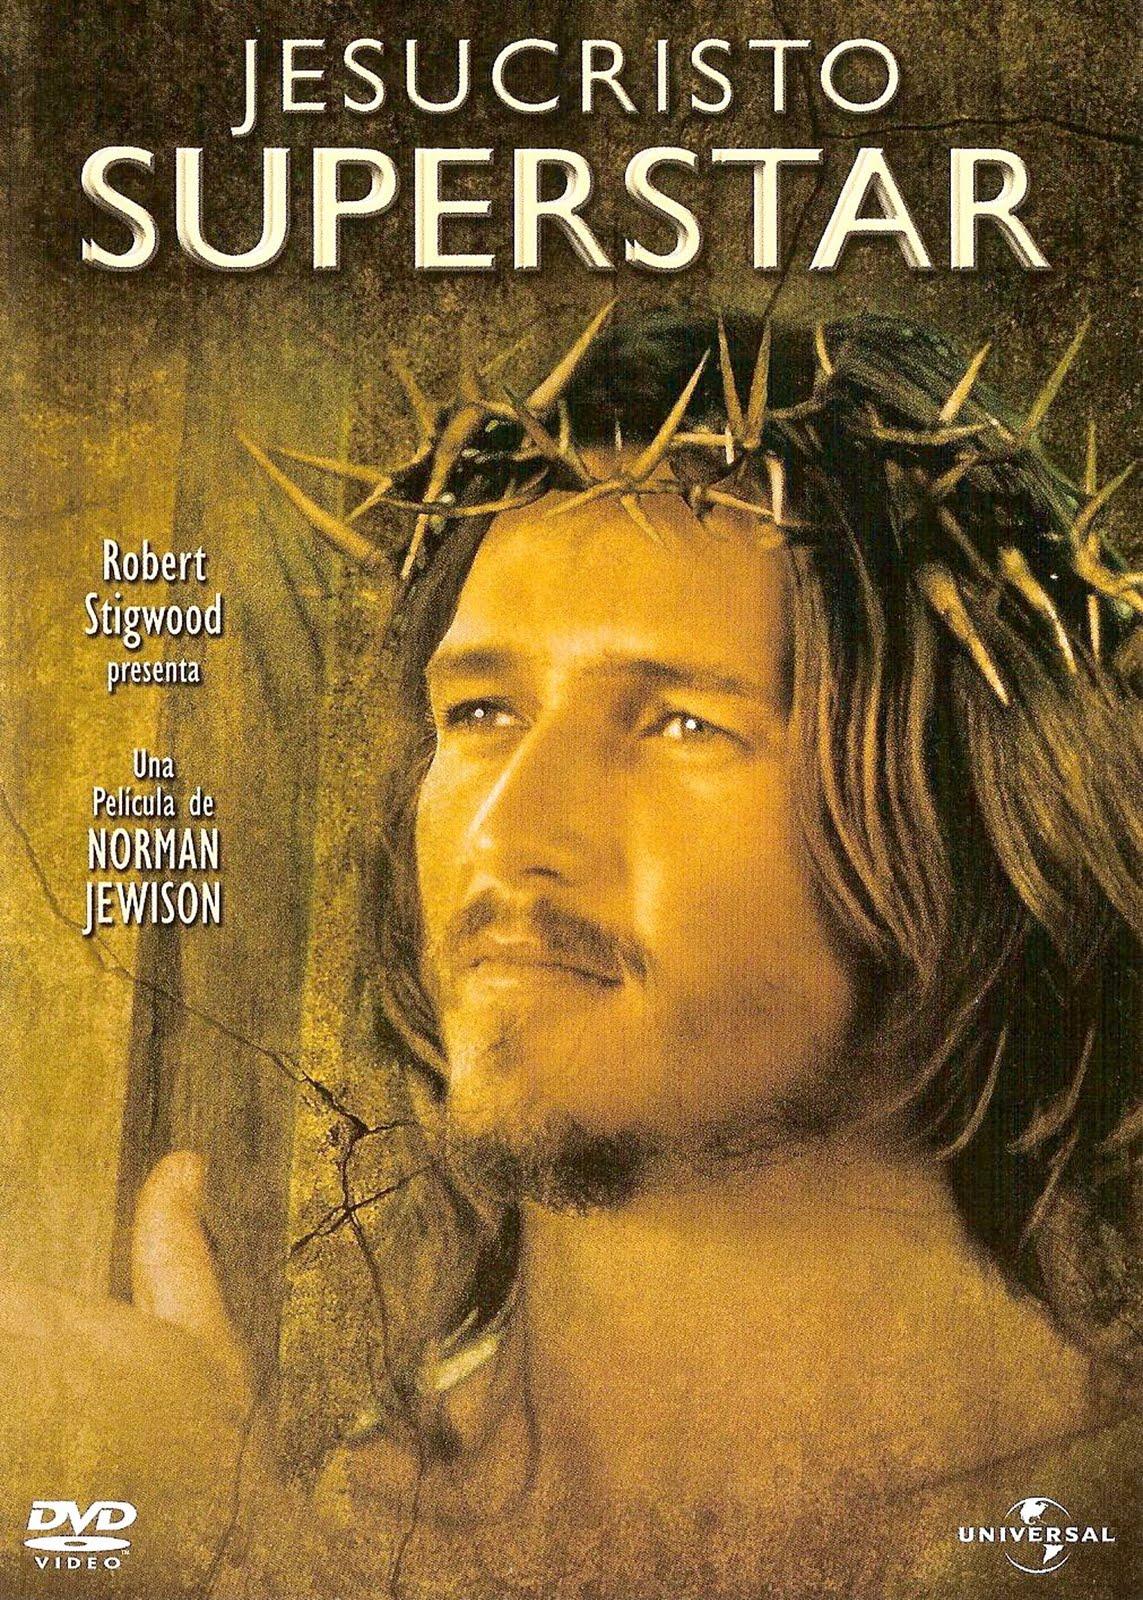 Mejores películas para semana santa jesucristo superstar